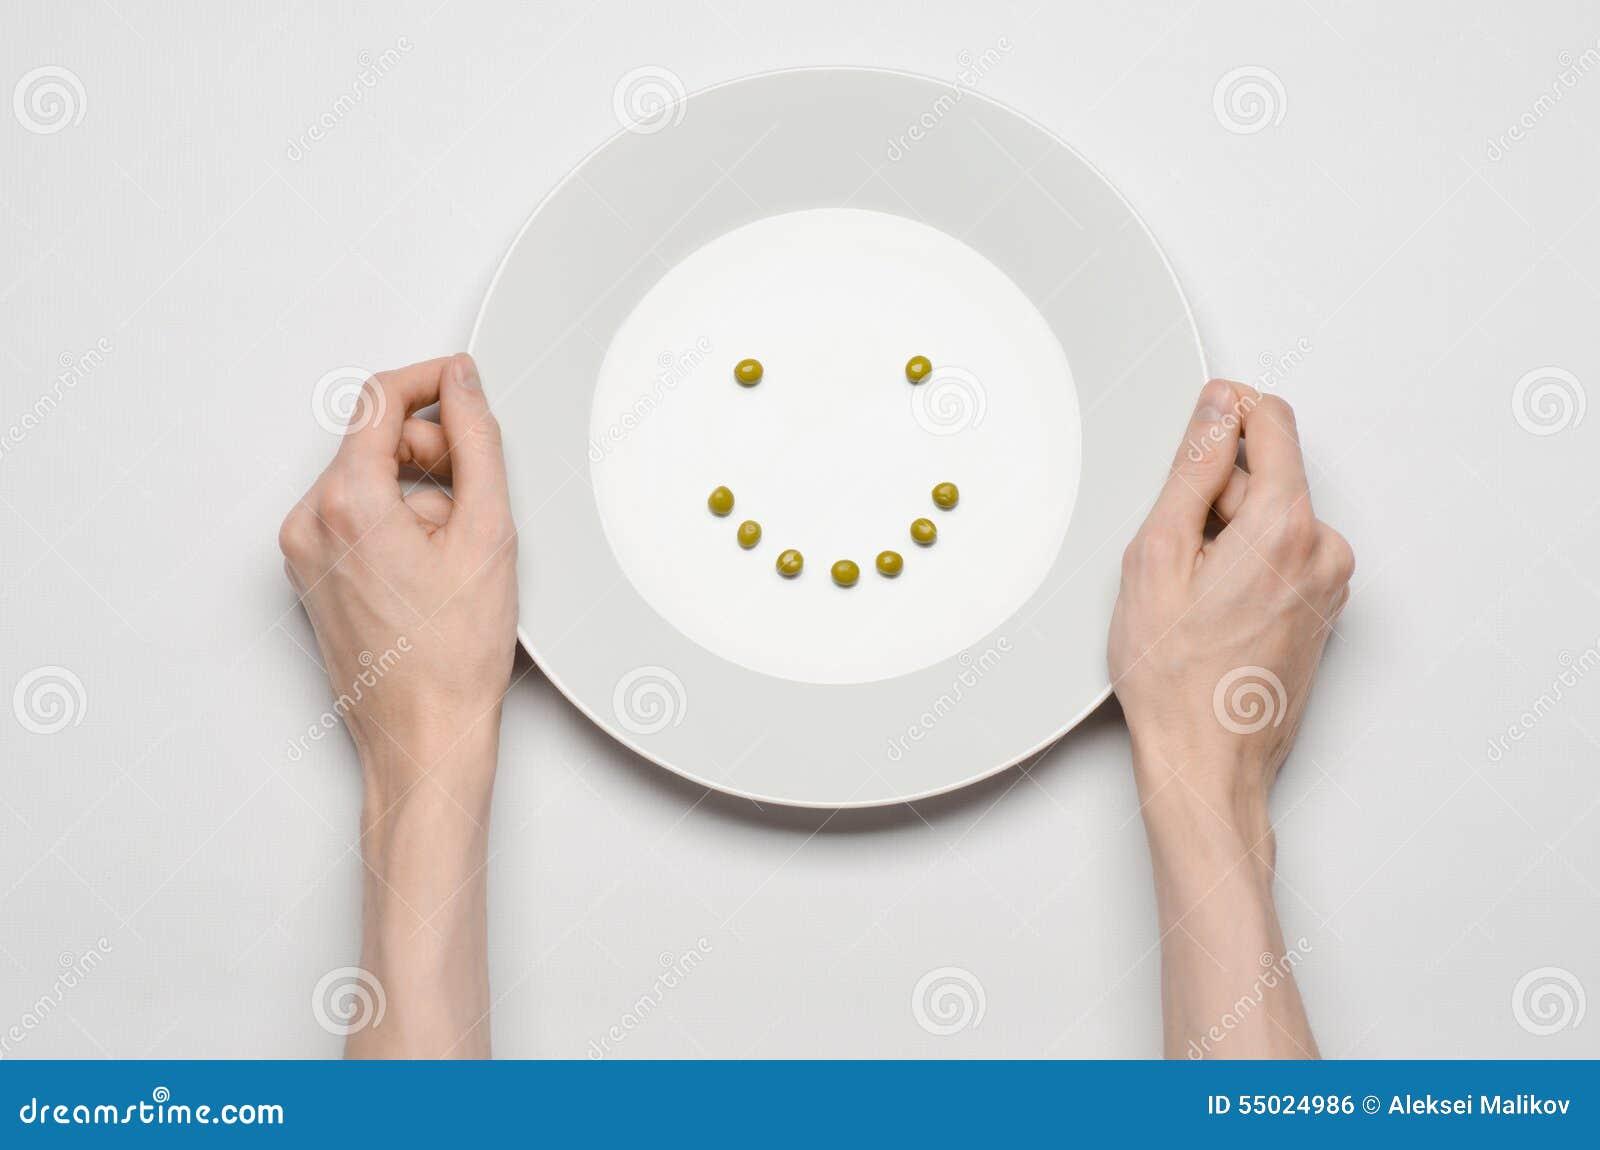 green theme happy easter dinner or breakfast table setting